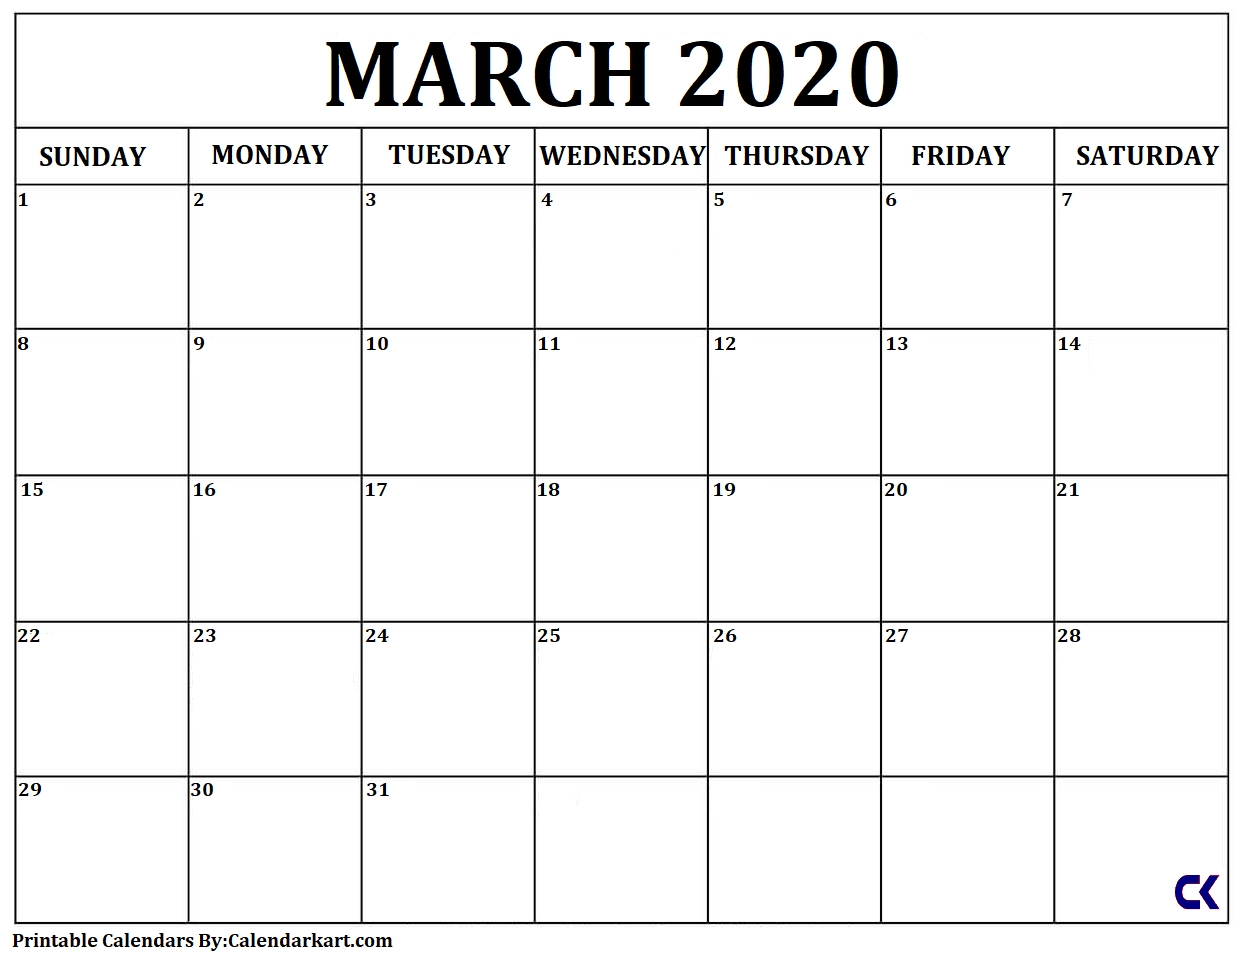 Printable March 2020 Calendar » Calendarkart